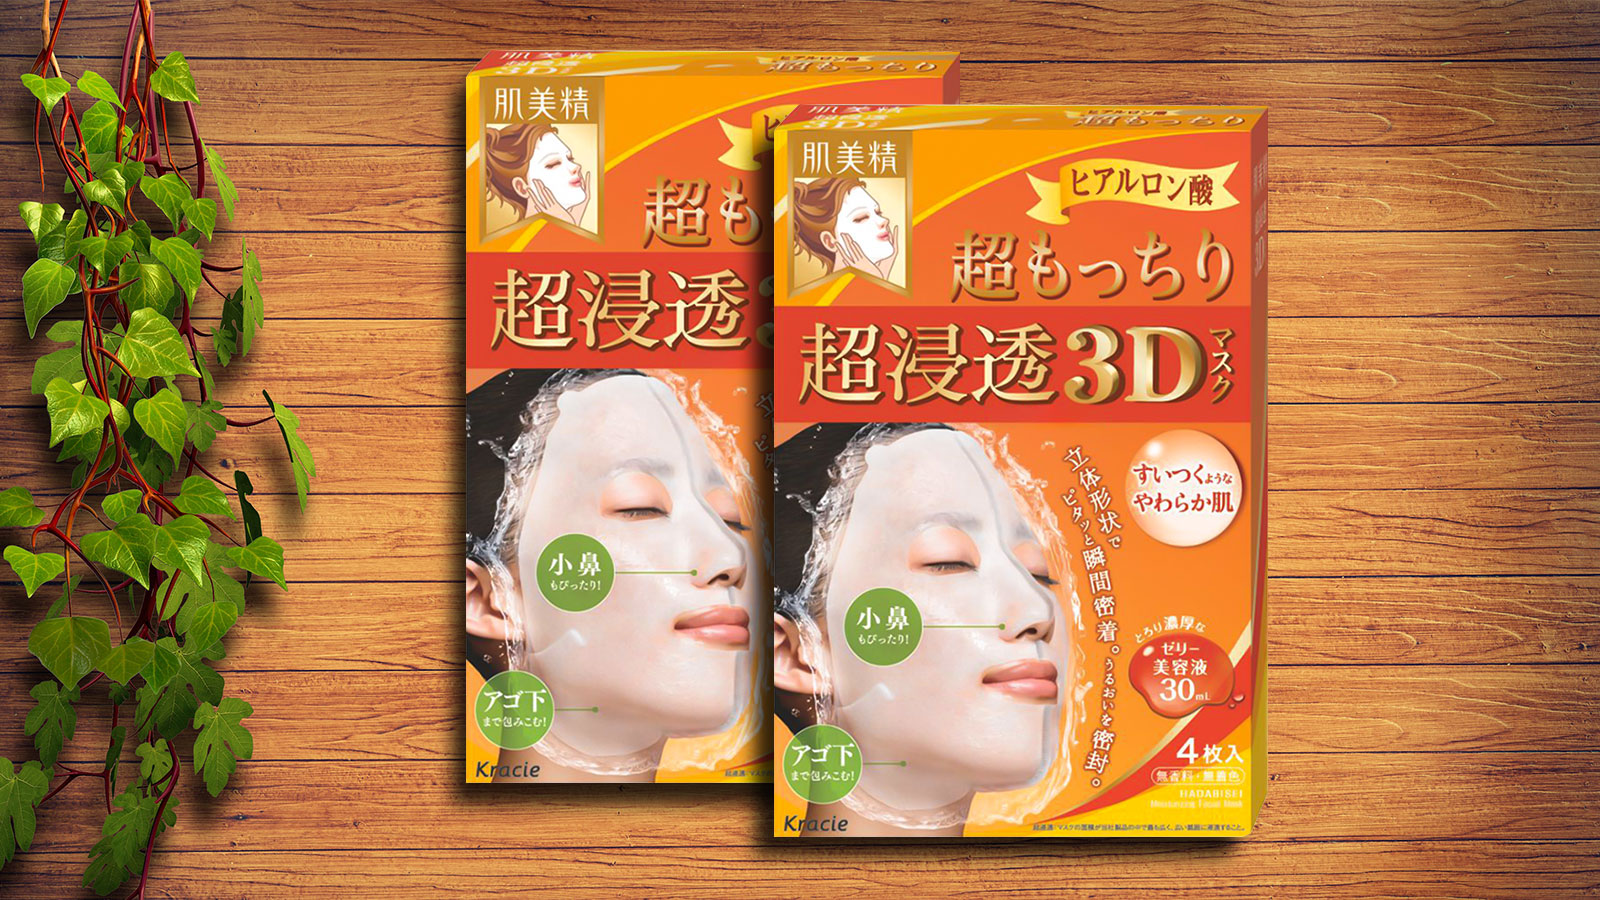 Mặt nạ dưỡng ẩm, làm mịn da Kracie Hadabisei 3D 4 miếng